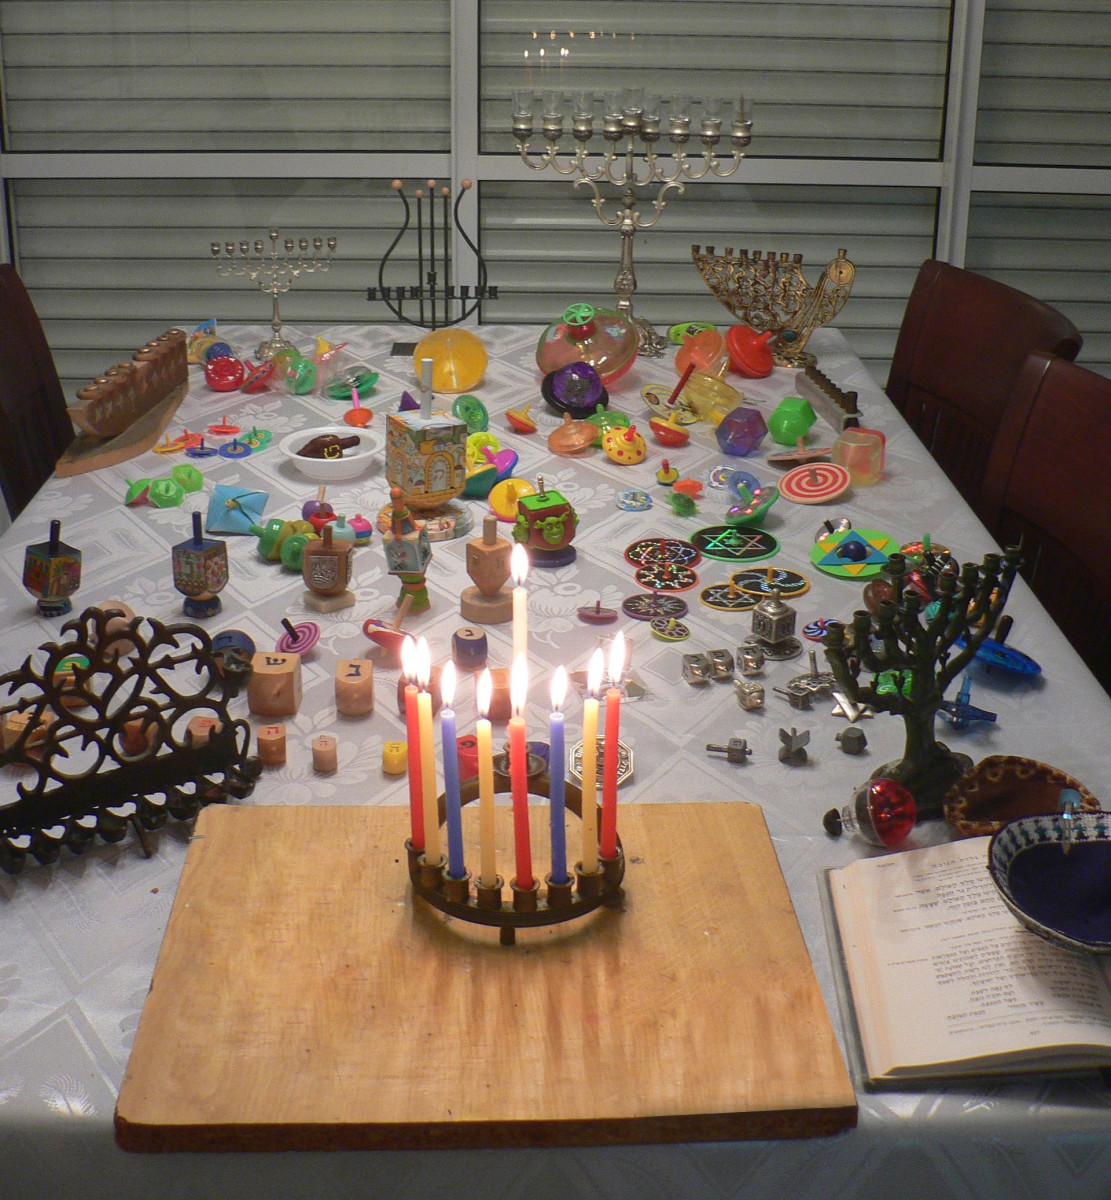 The menorah and dreidel are traditional Hanukkah objects.